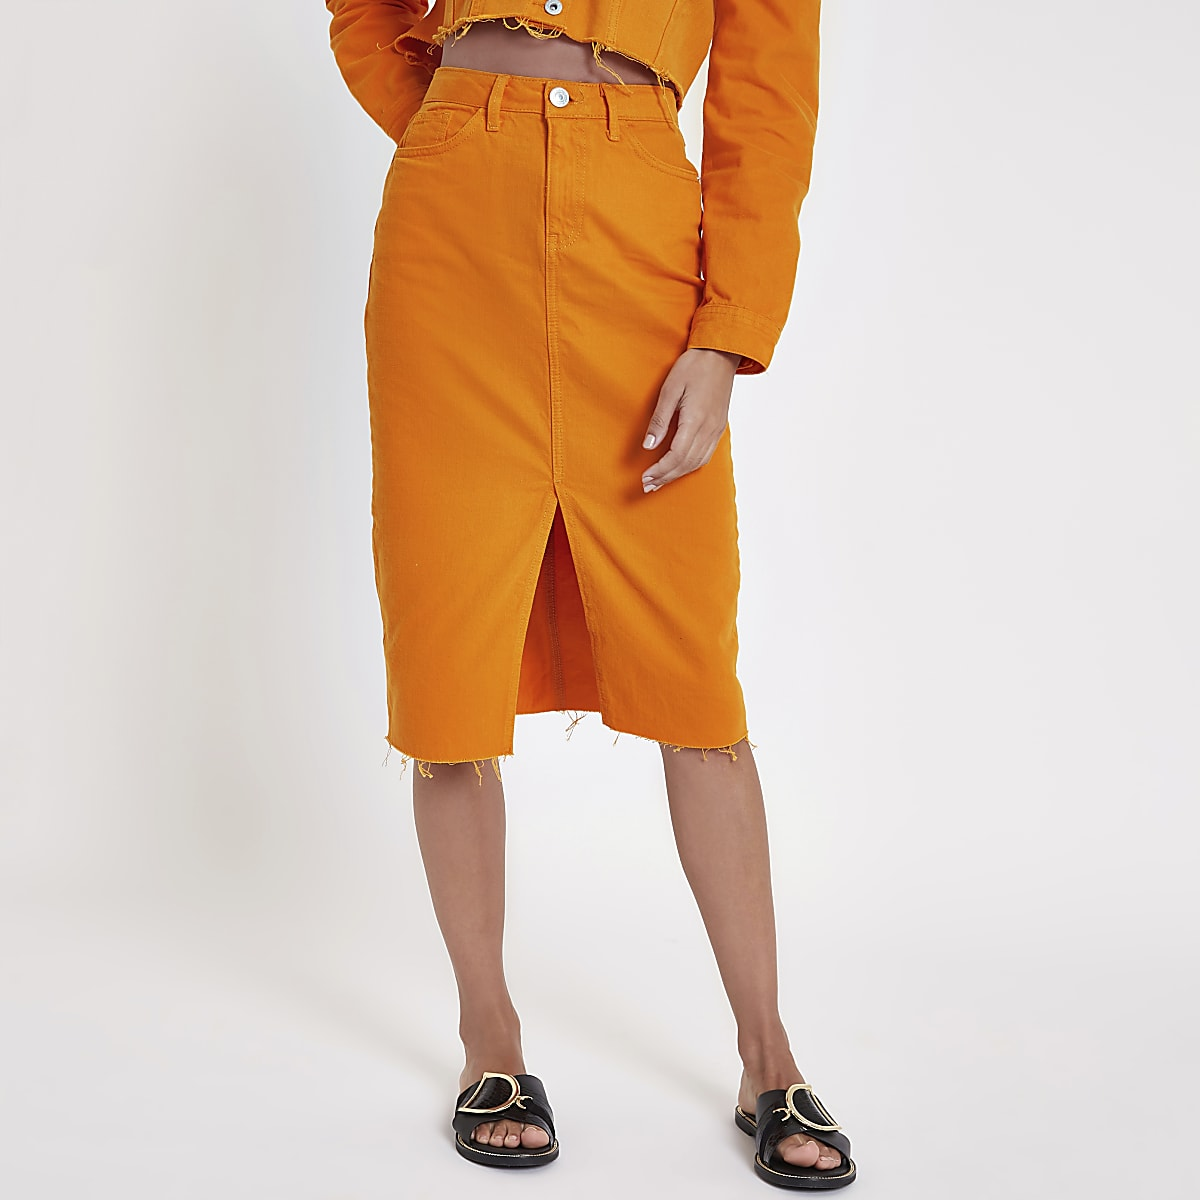 Orange denim pencil skirt